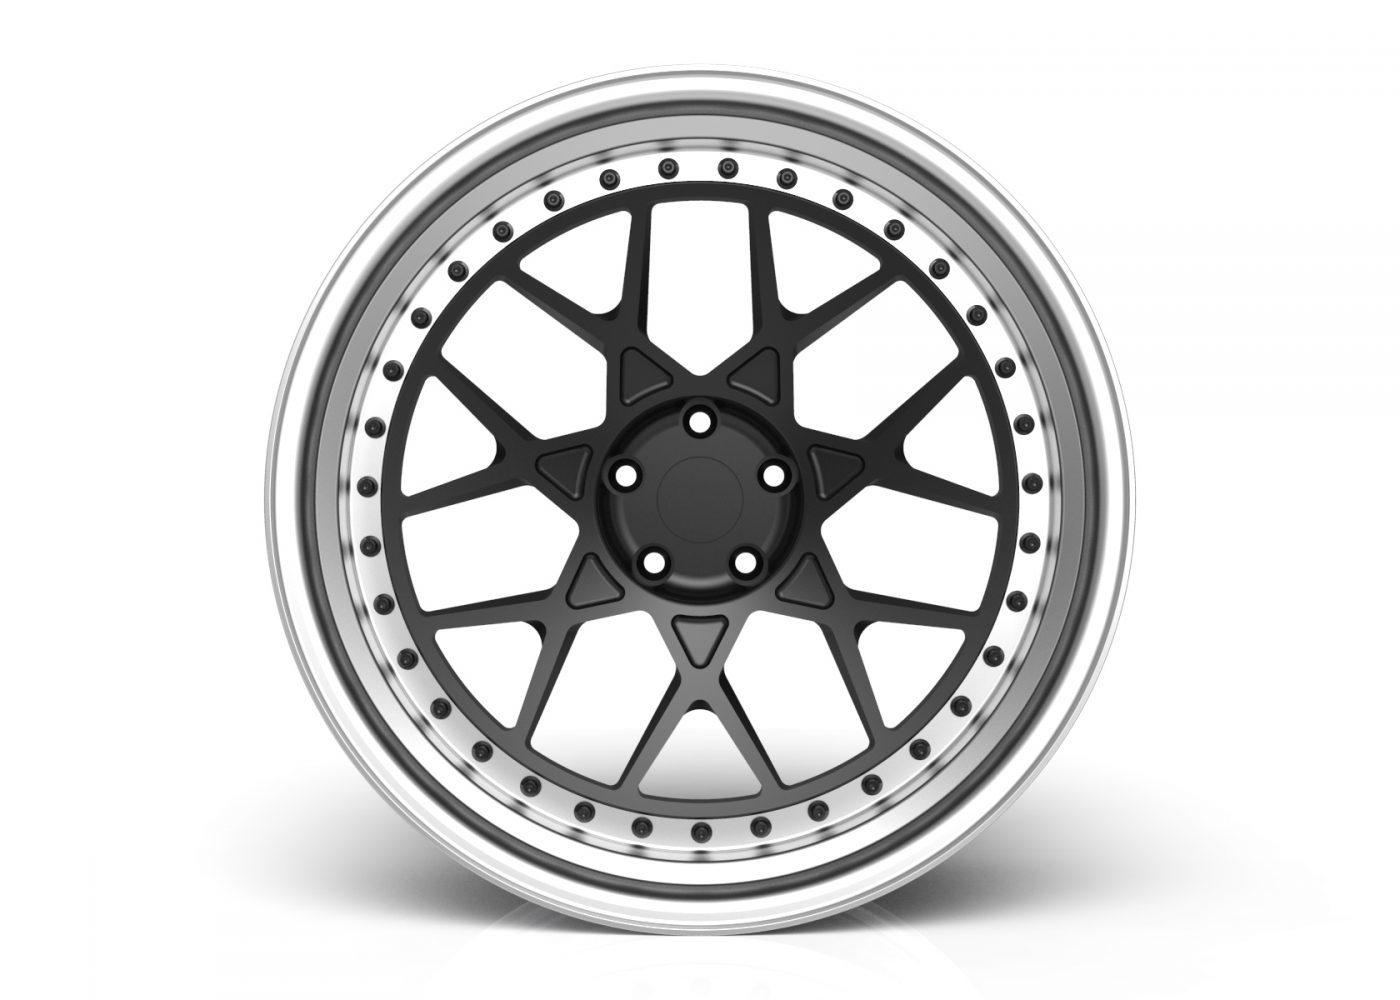 3SDM 3.46 FR SERIES Forged Wheels